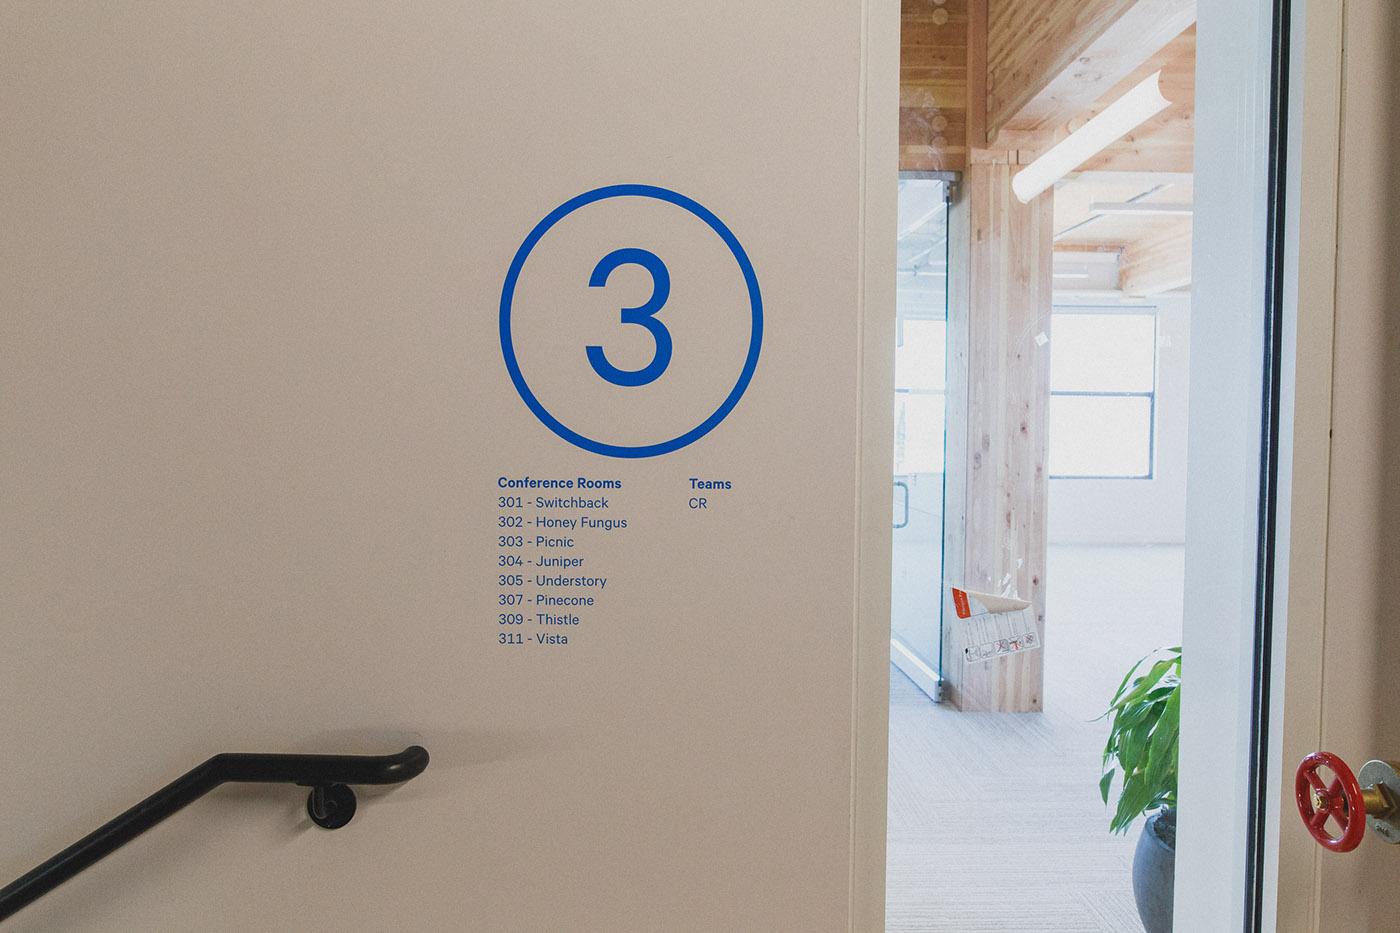 Simple新总部环境图形设计©Jeff Walls